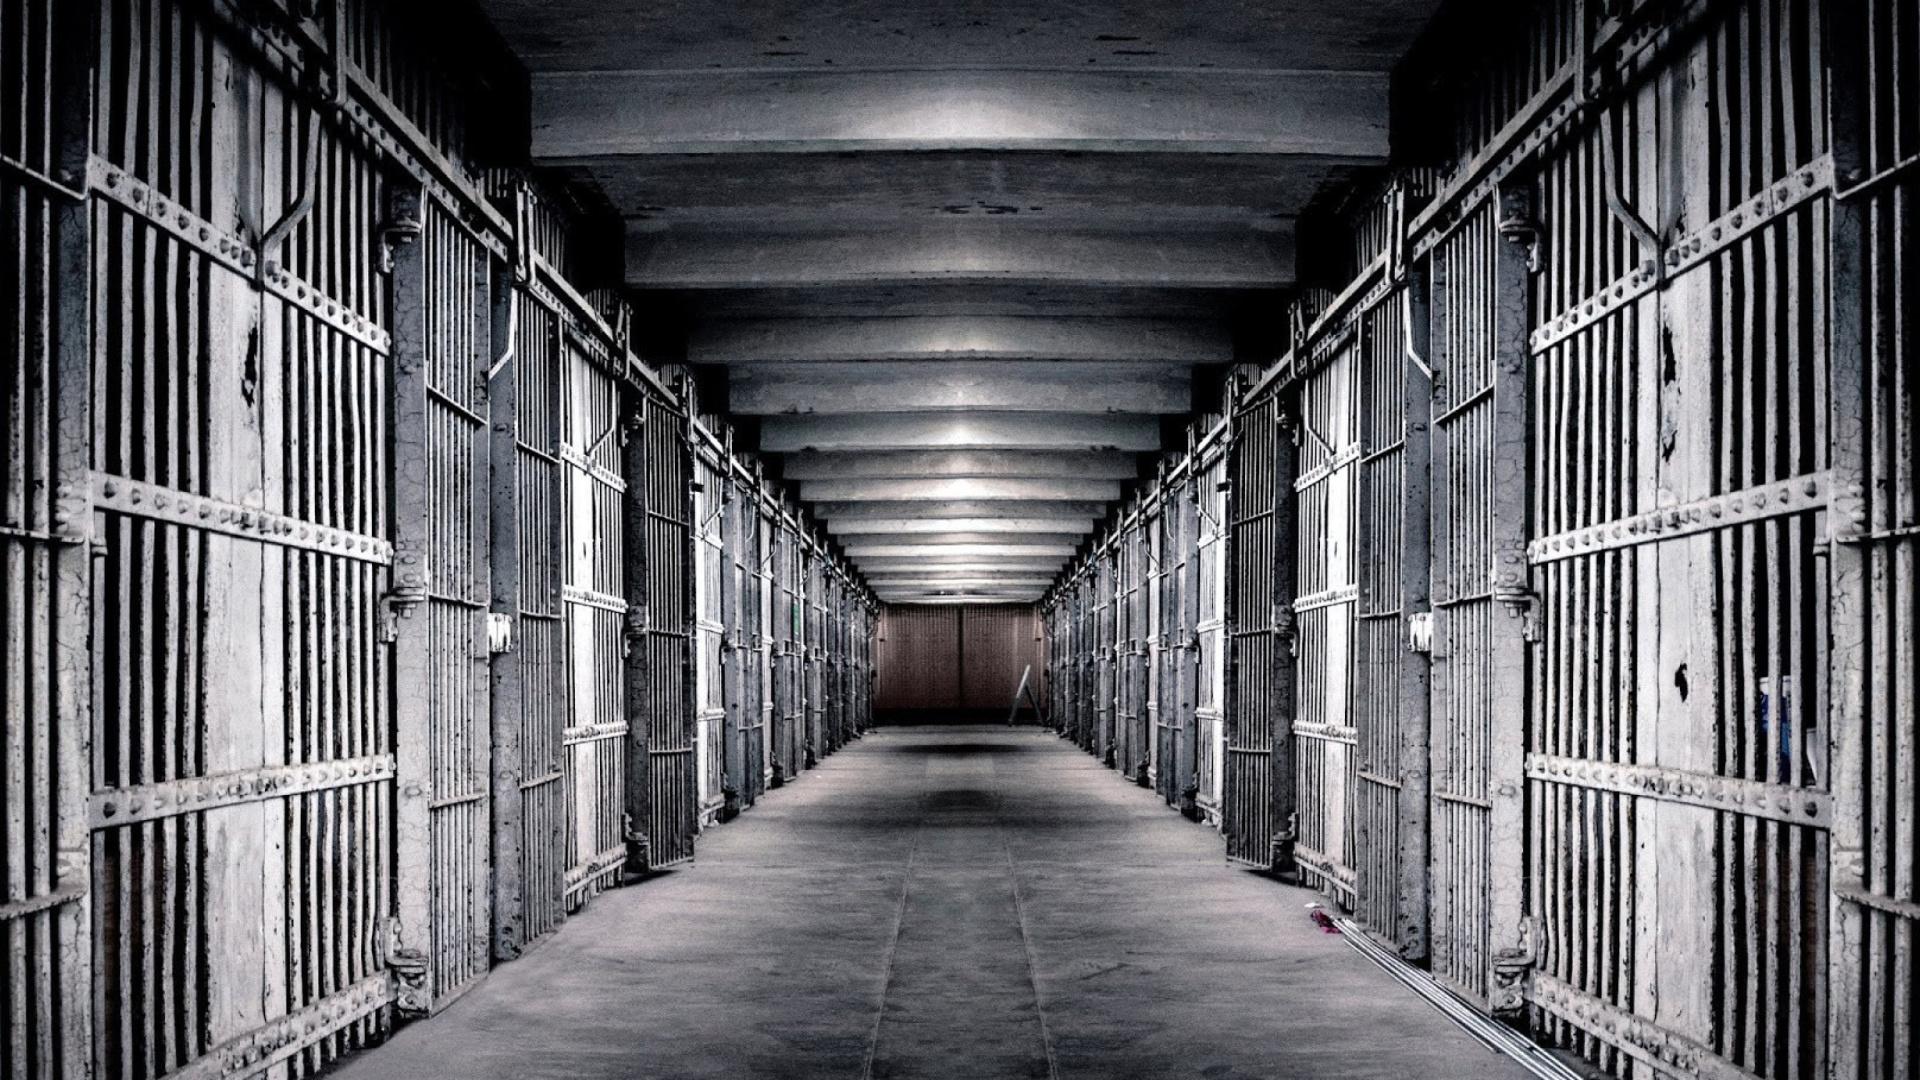 Prison HD Wallpaper Background Image 1920x1080 ID743102 1920x1080